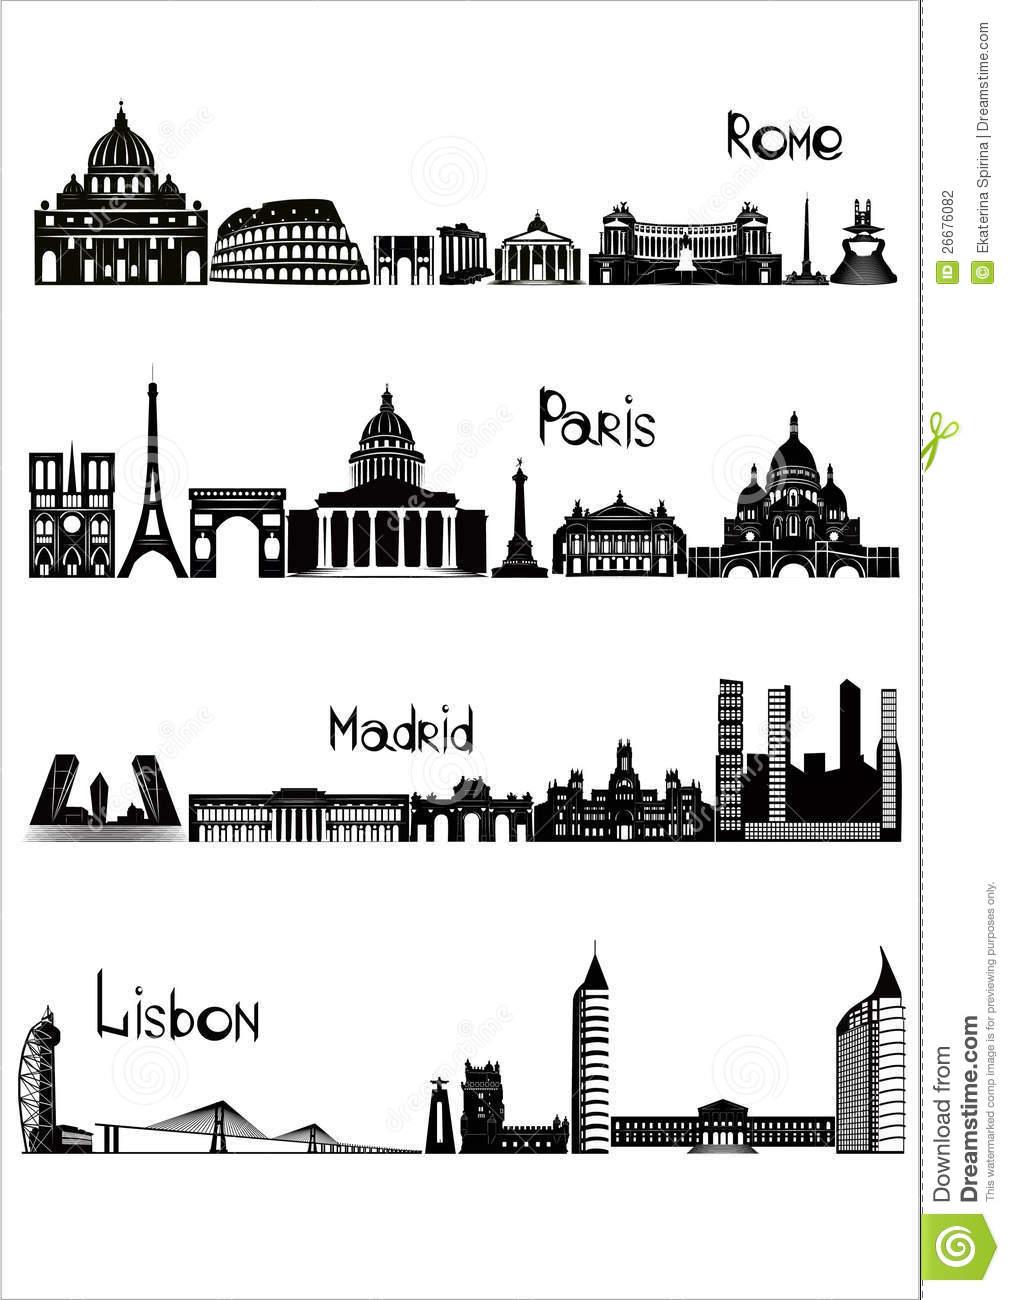 Sights Of Rome, Paris, Madrid And Lisbon, B.